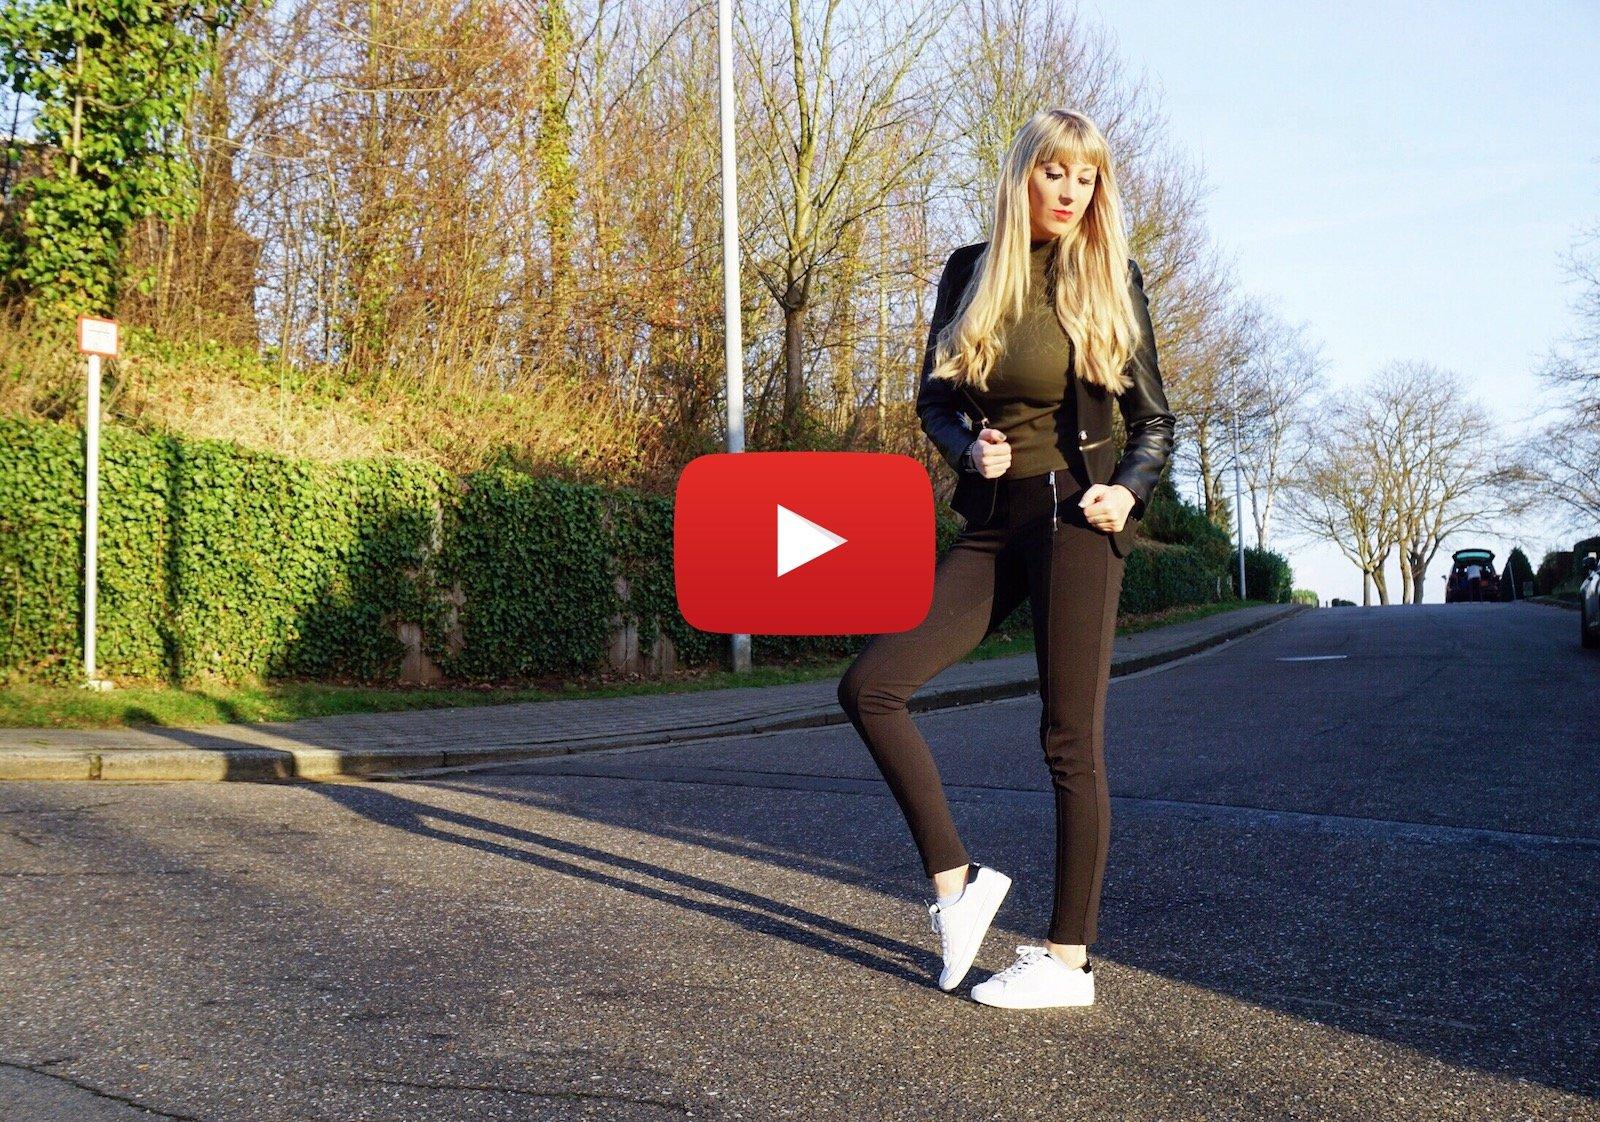 jenna minnie fashion blog beauty lifestyle youtube video